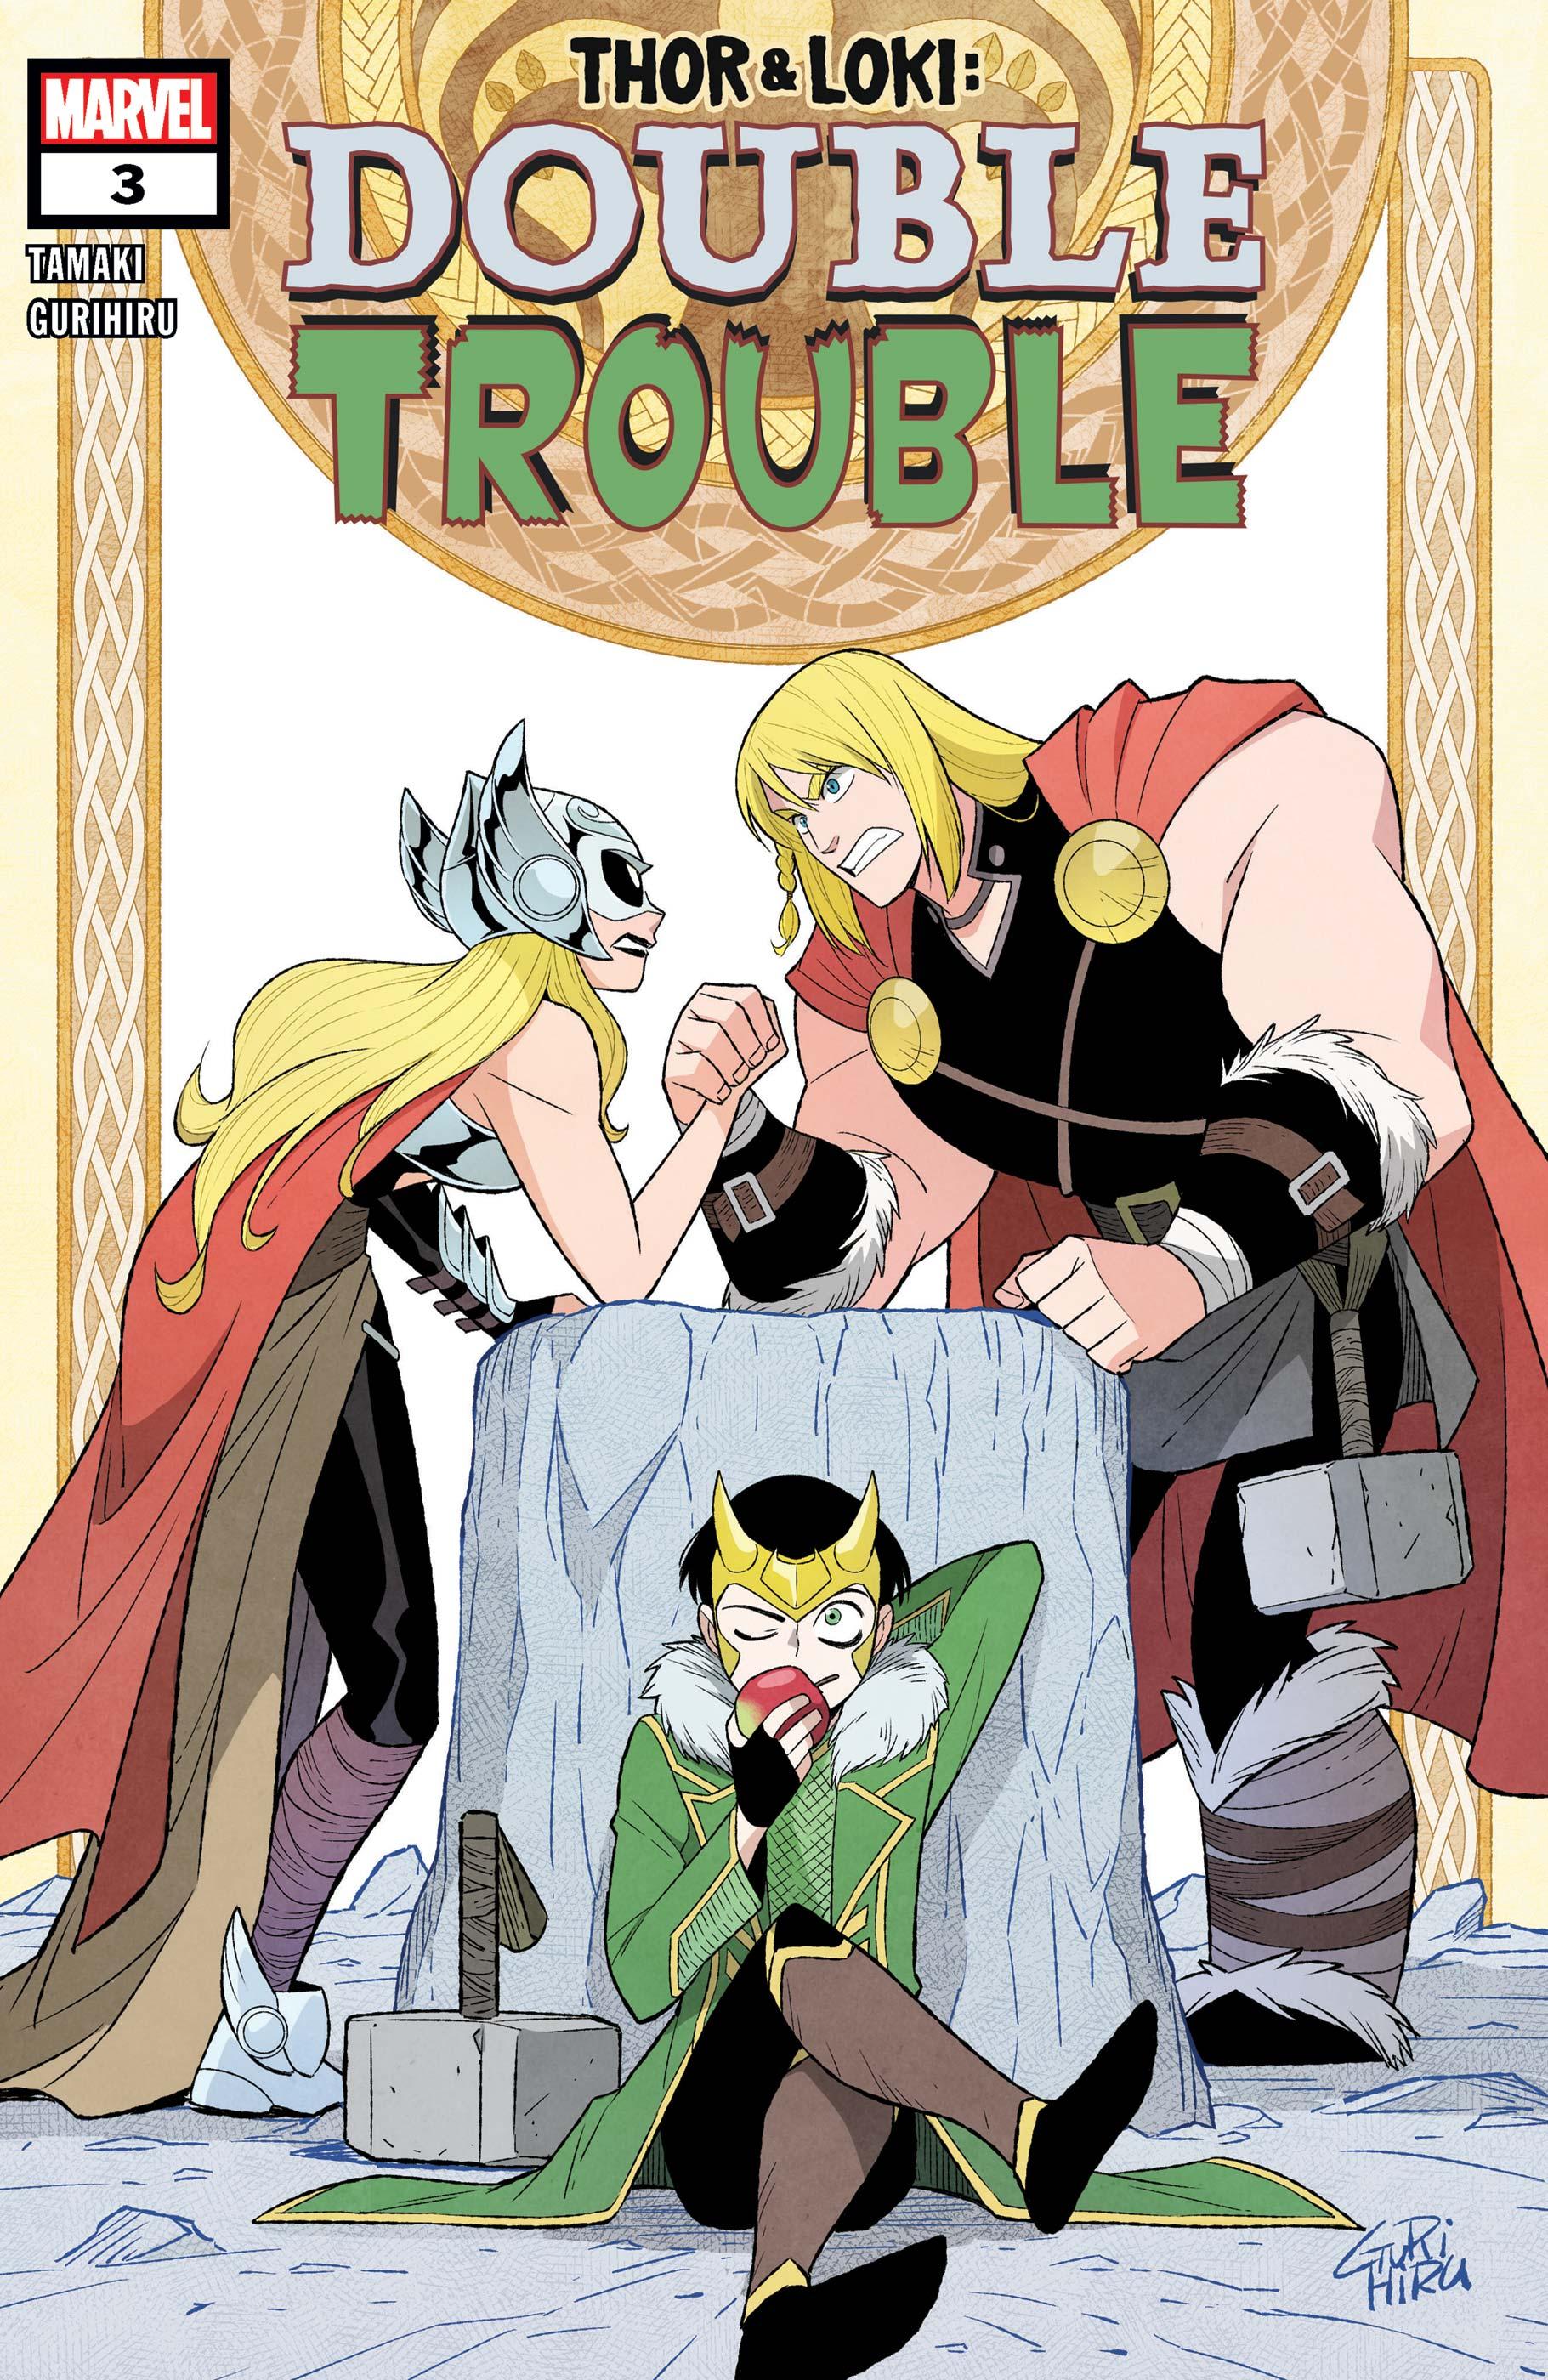 Thor & Loki: Double Trouble #3 Cover by G Gurihiru